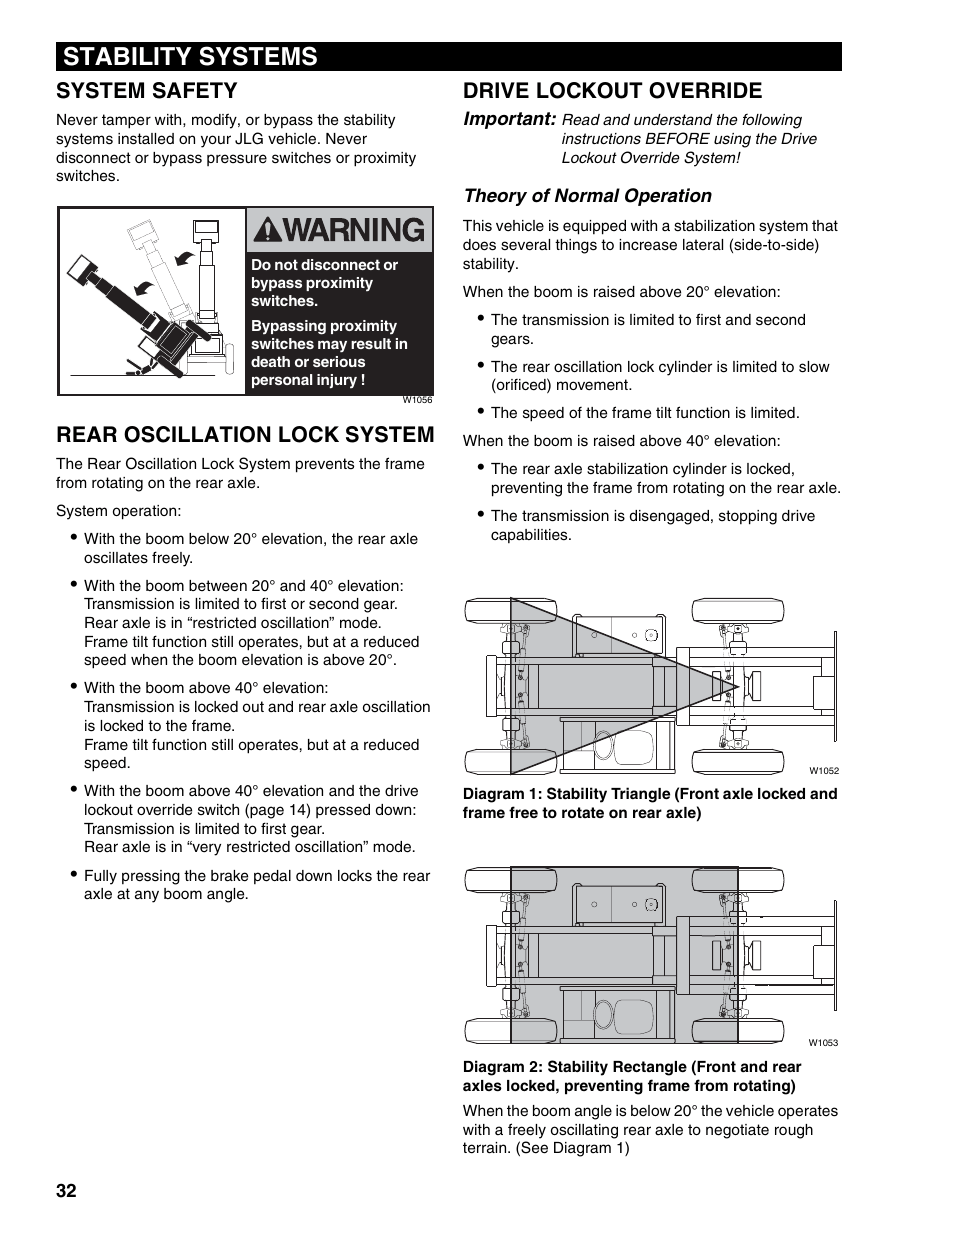 Stability systems, System safety, Rear oscillation lock